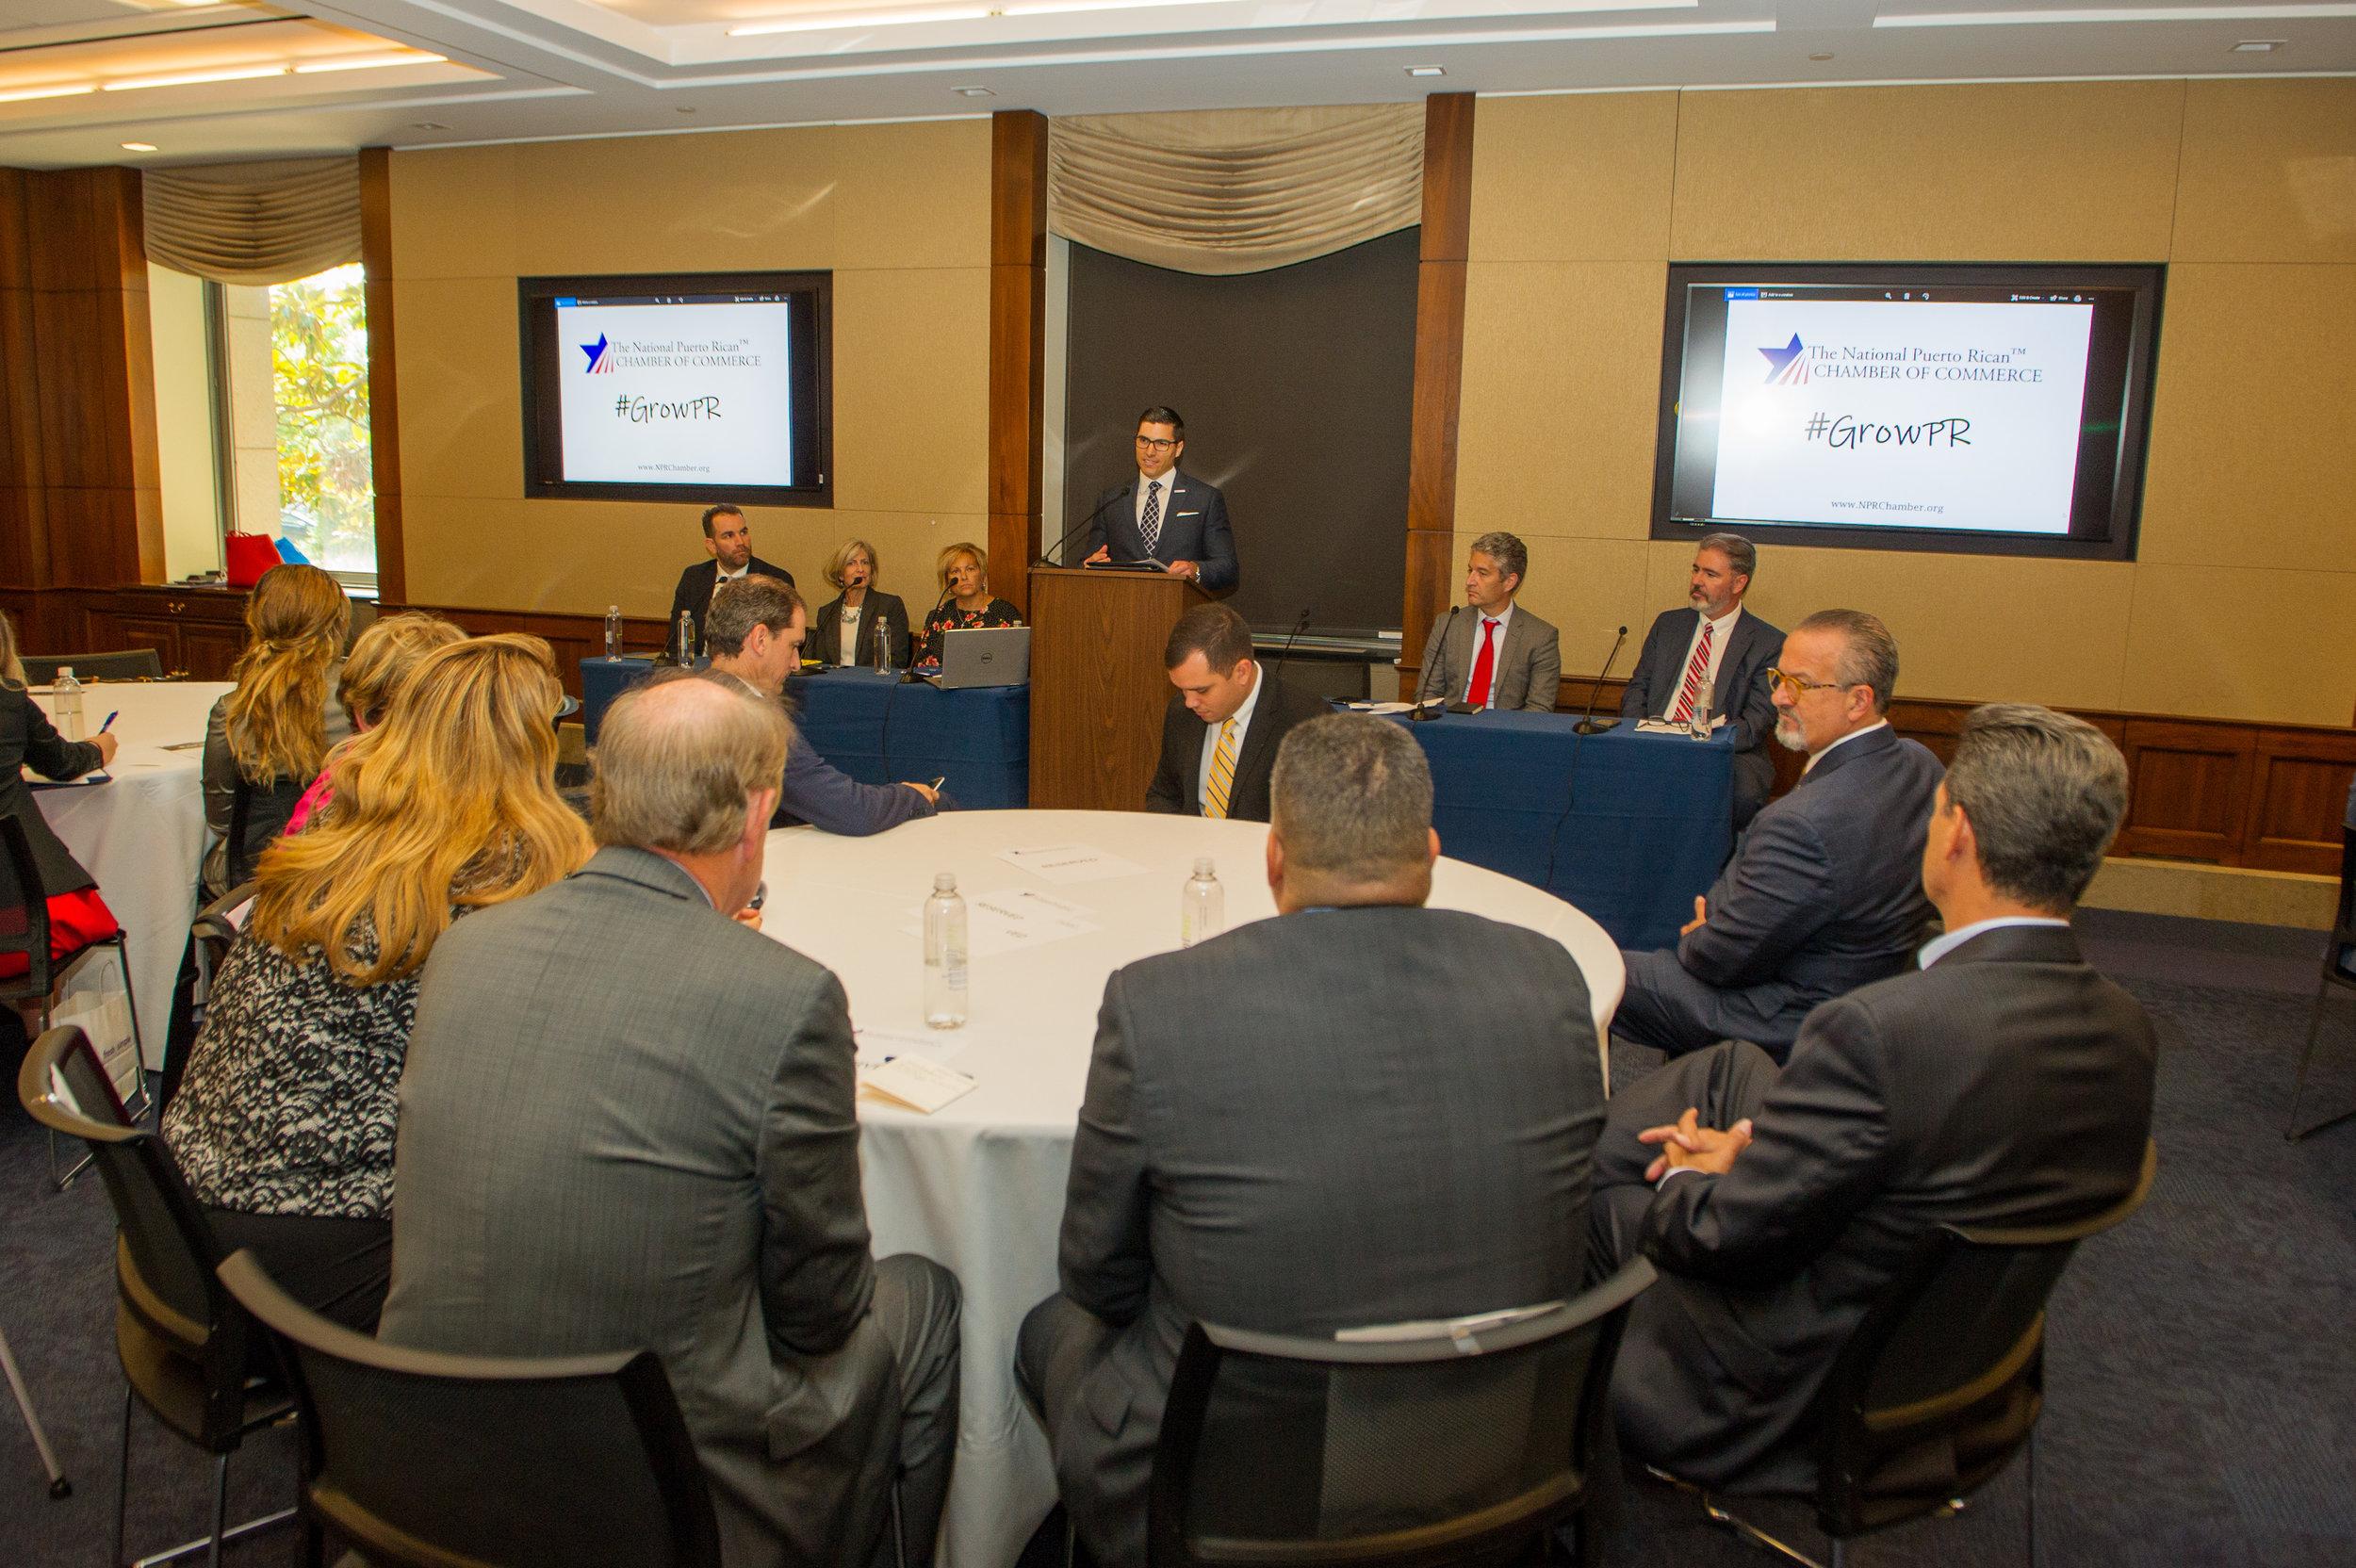 "Congresswoman Gonzalez-Colon, Rodrigo Masses, Mayor ""Mayita"" Melendez, and more listen to Executive Director Velez-Hagan provide opening remarks."